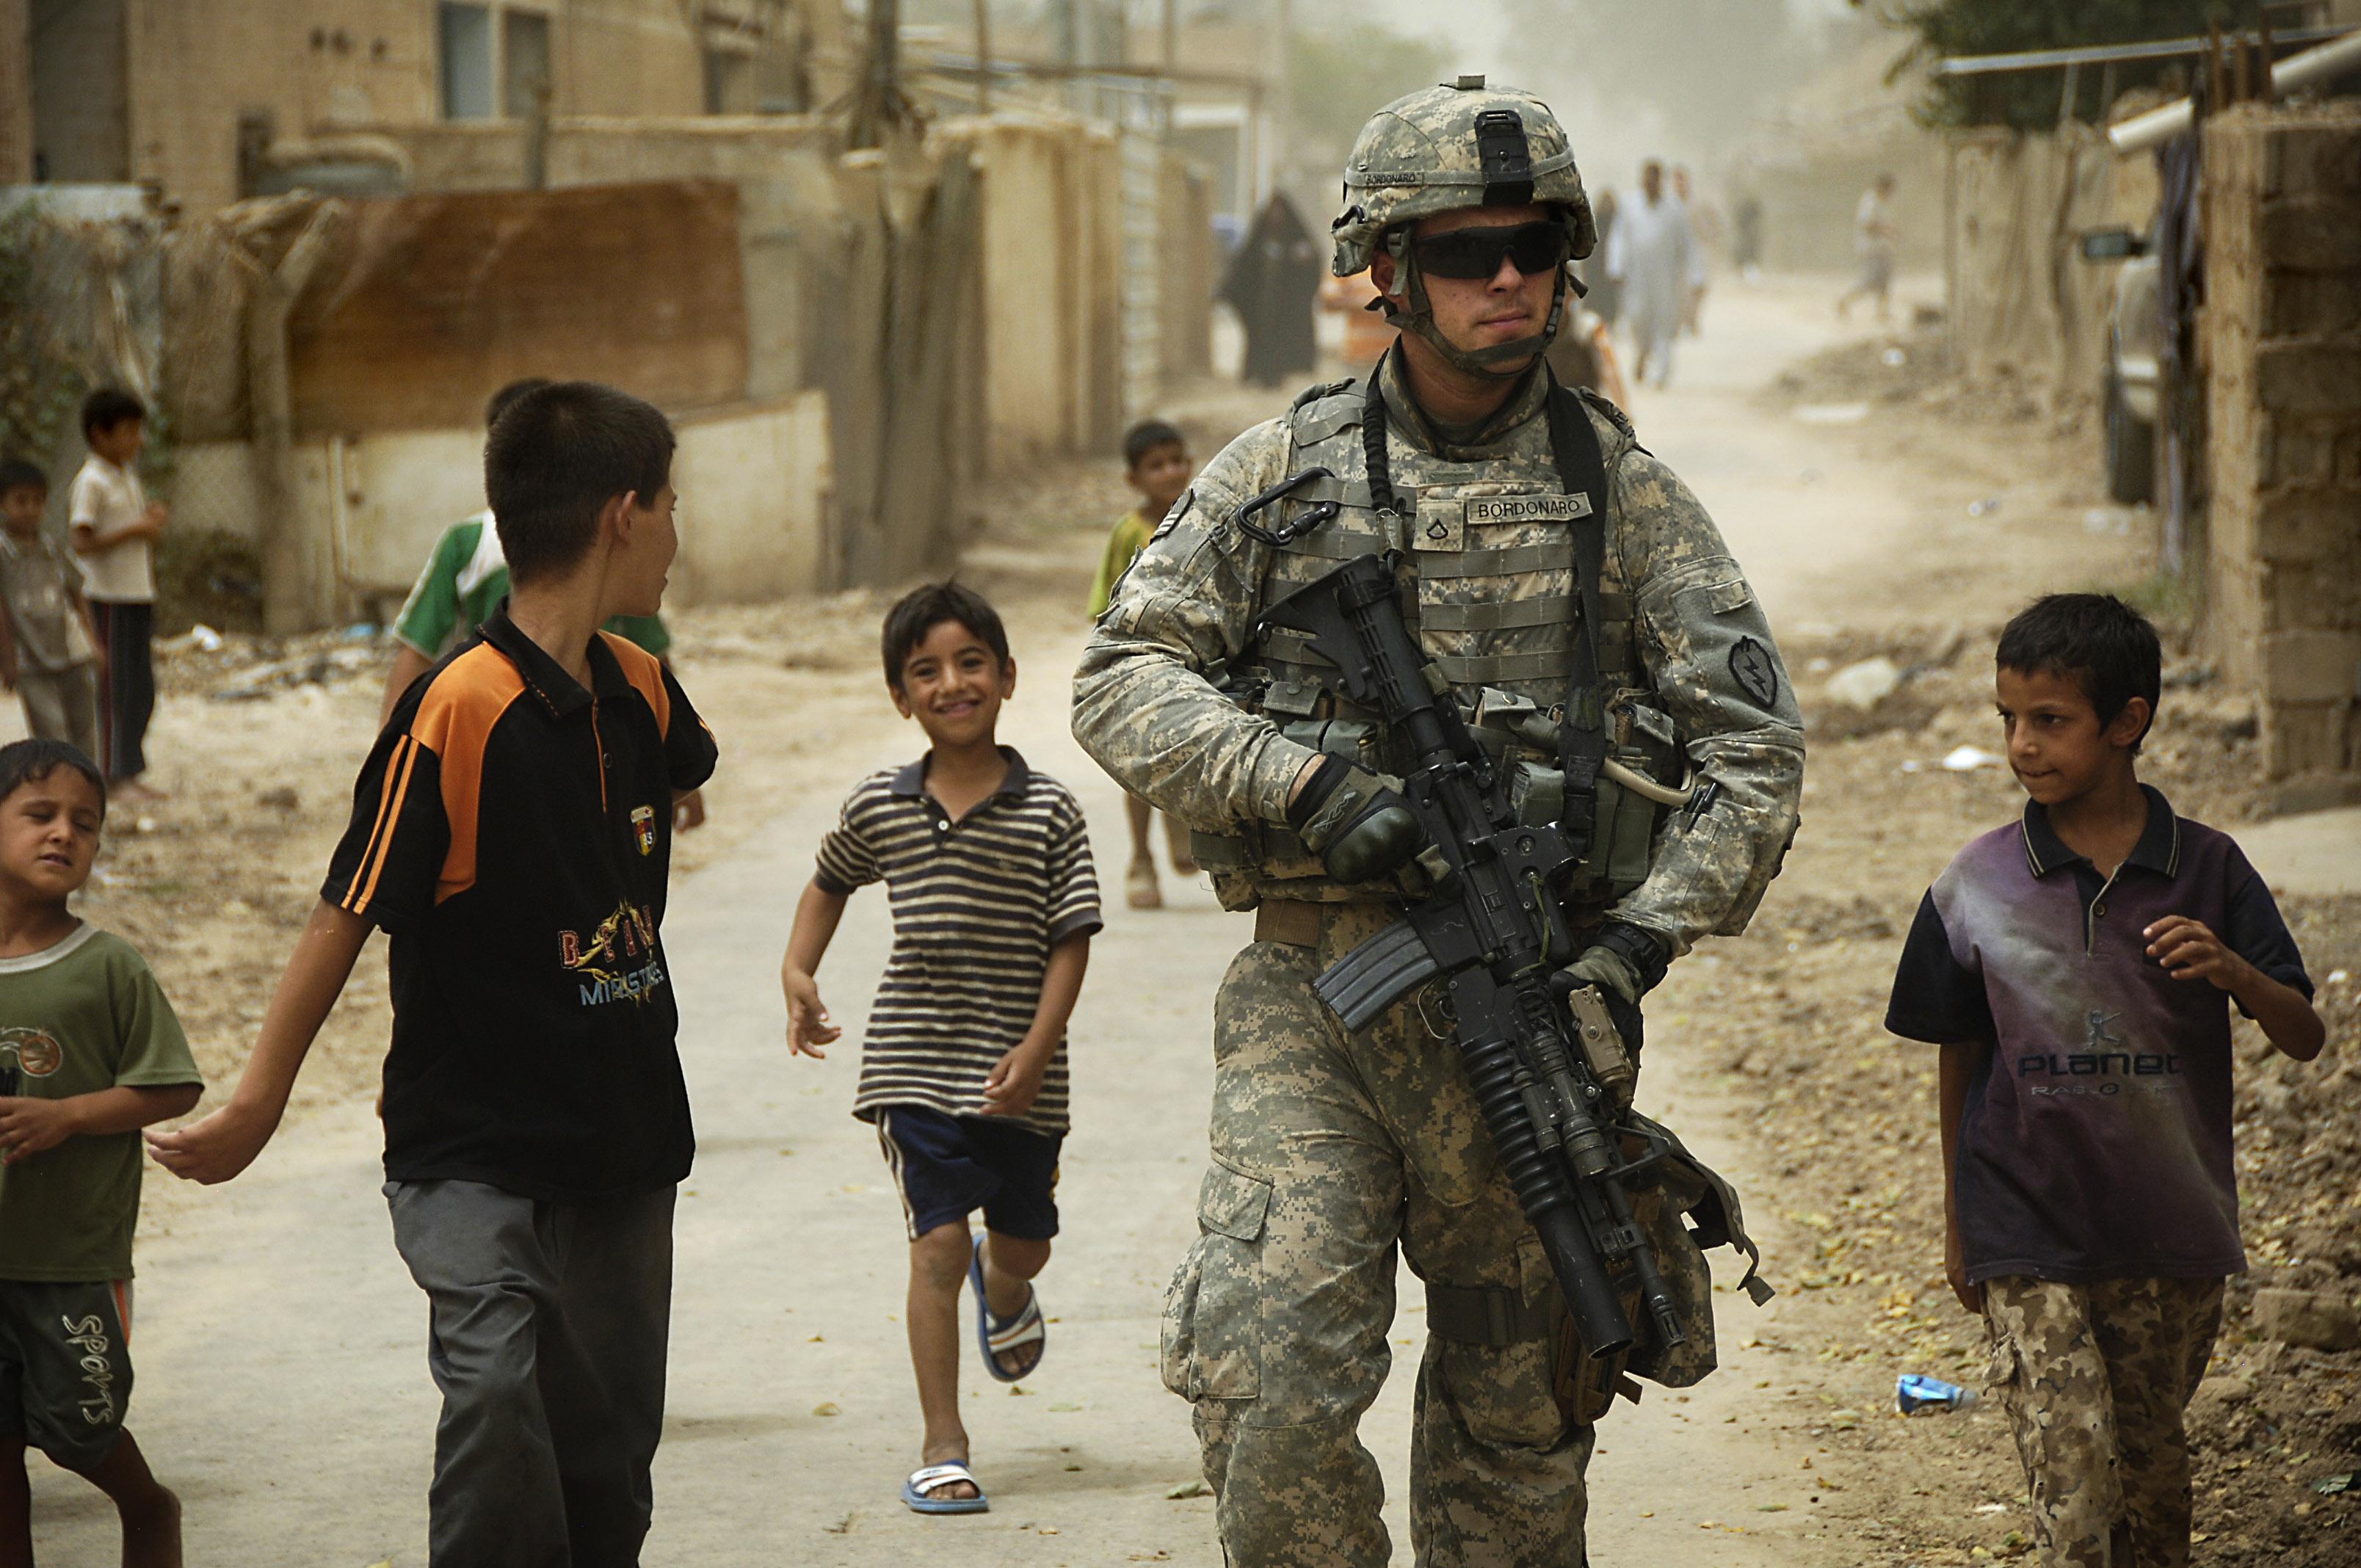 The Iraq War and Profiteering